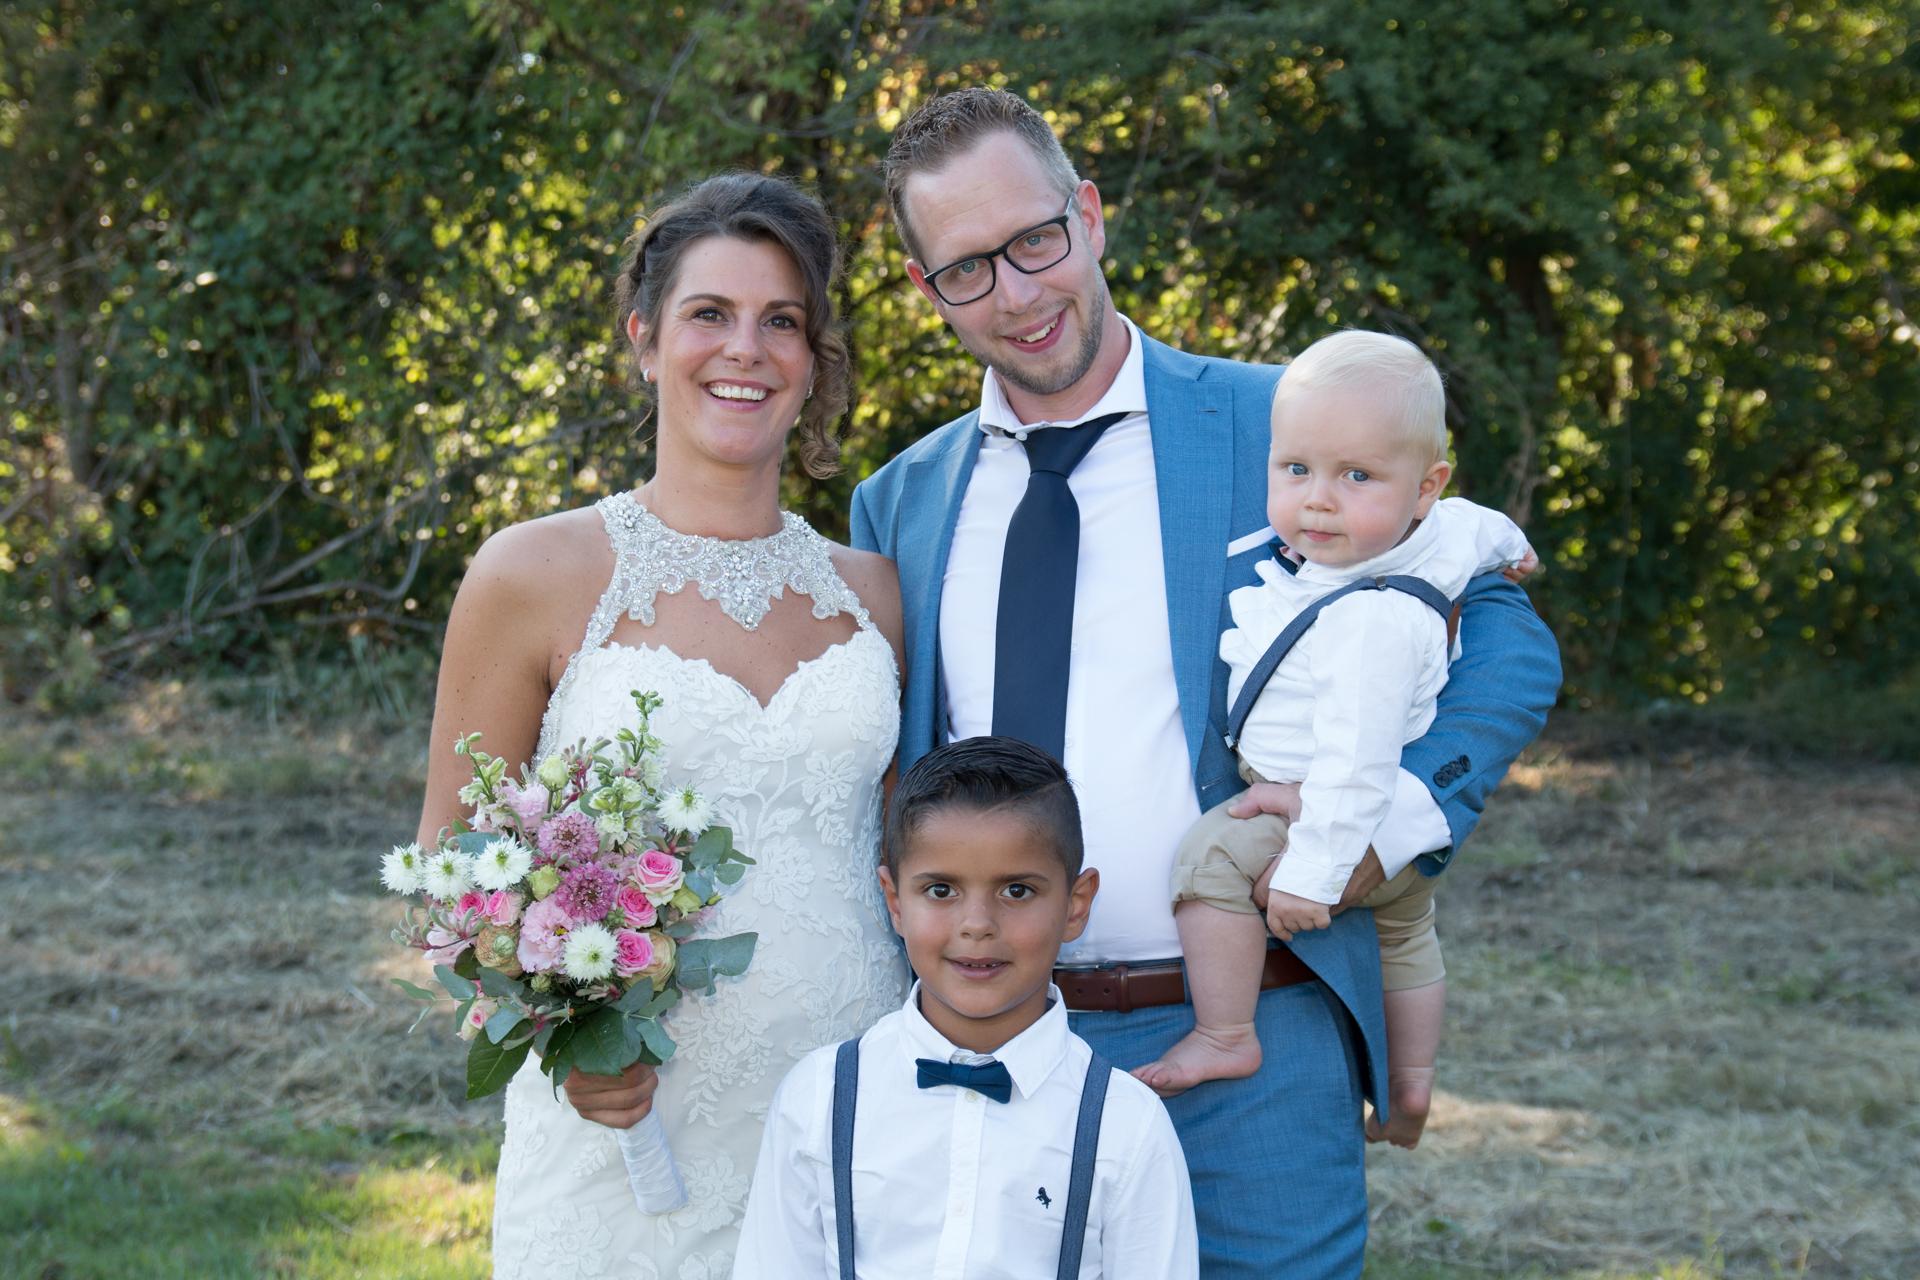 Denise en Kevin met hun gezin, trouwfoto